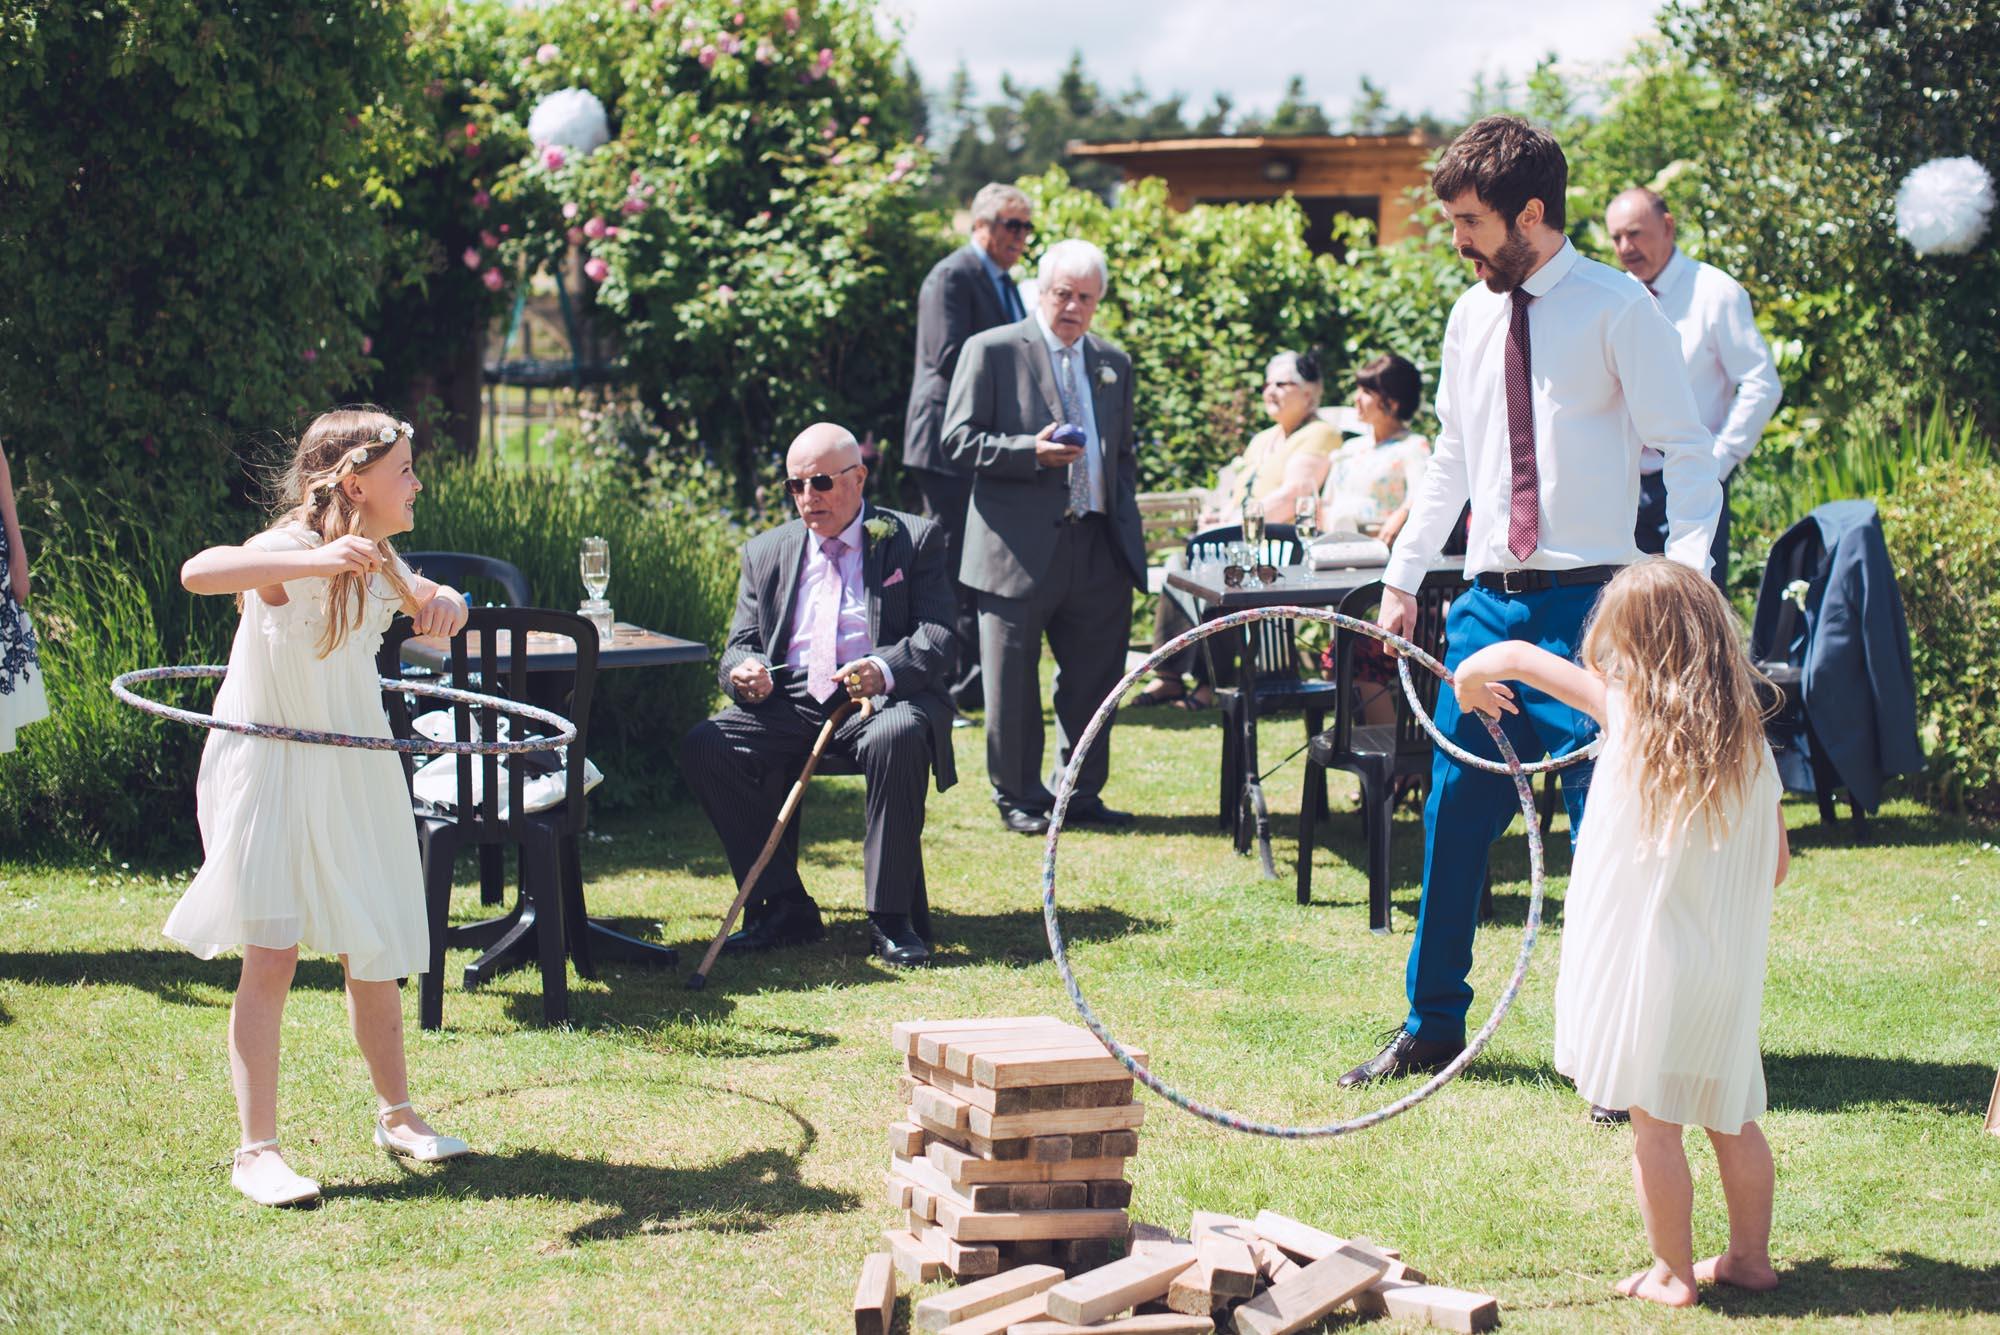 Nicola & Richard Wedding at Huntstile